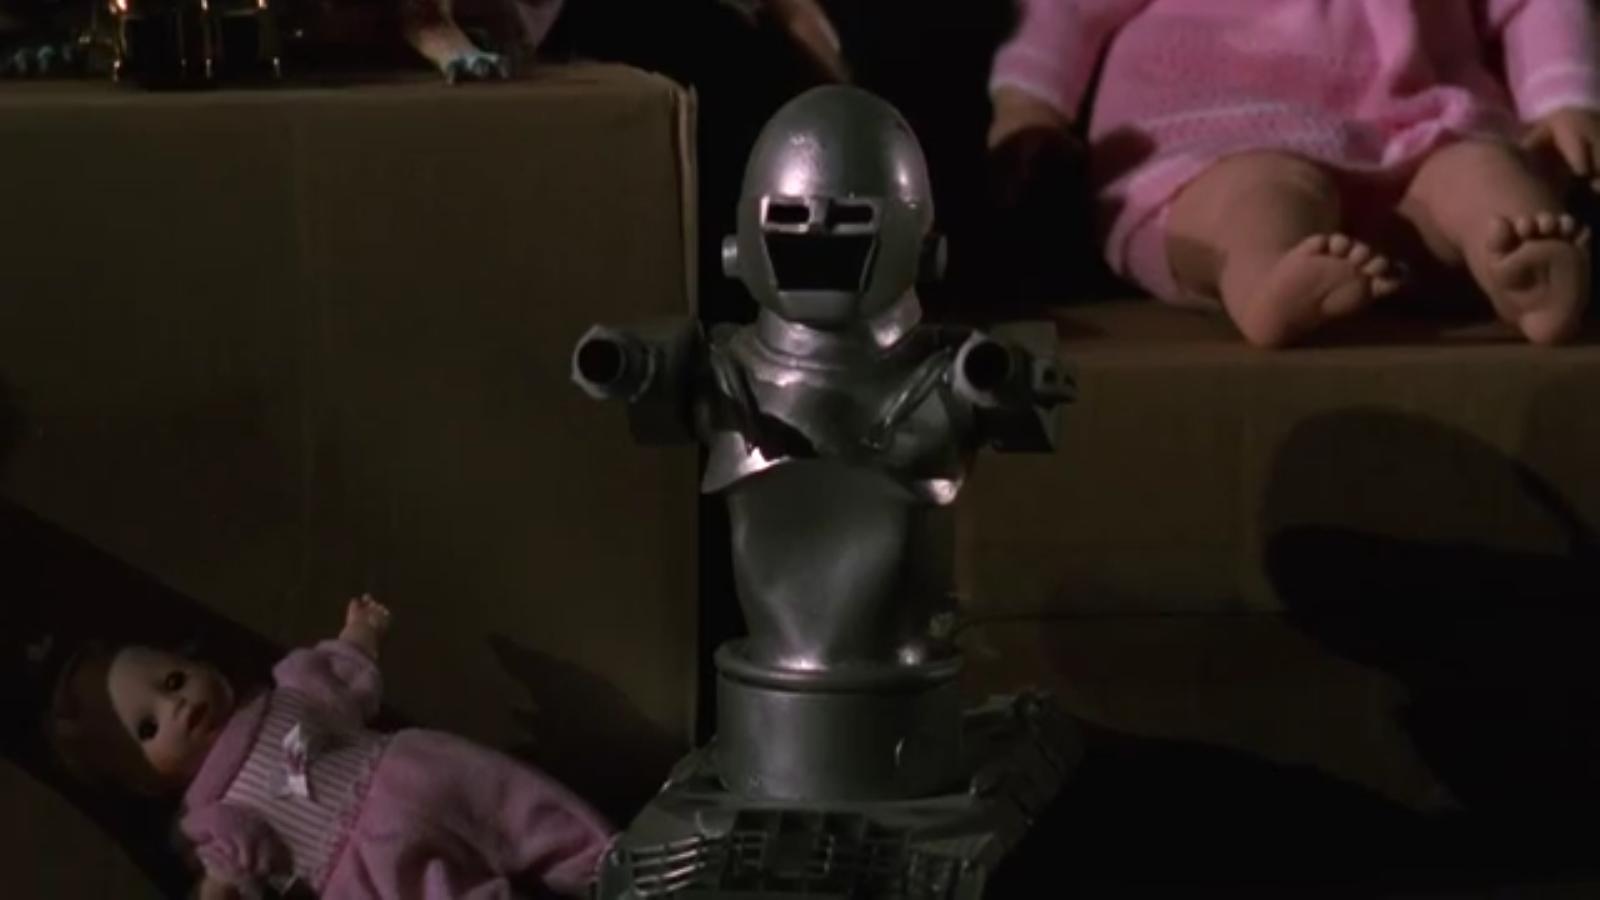 Robottf2